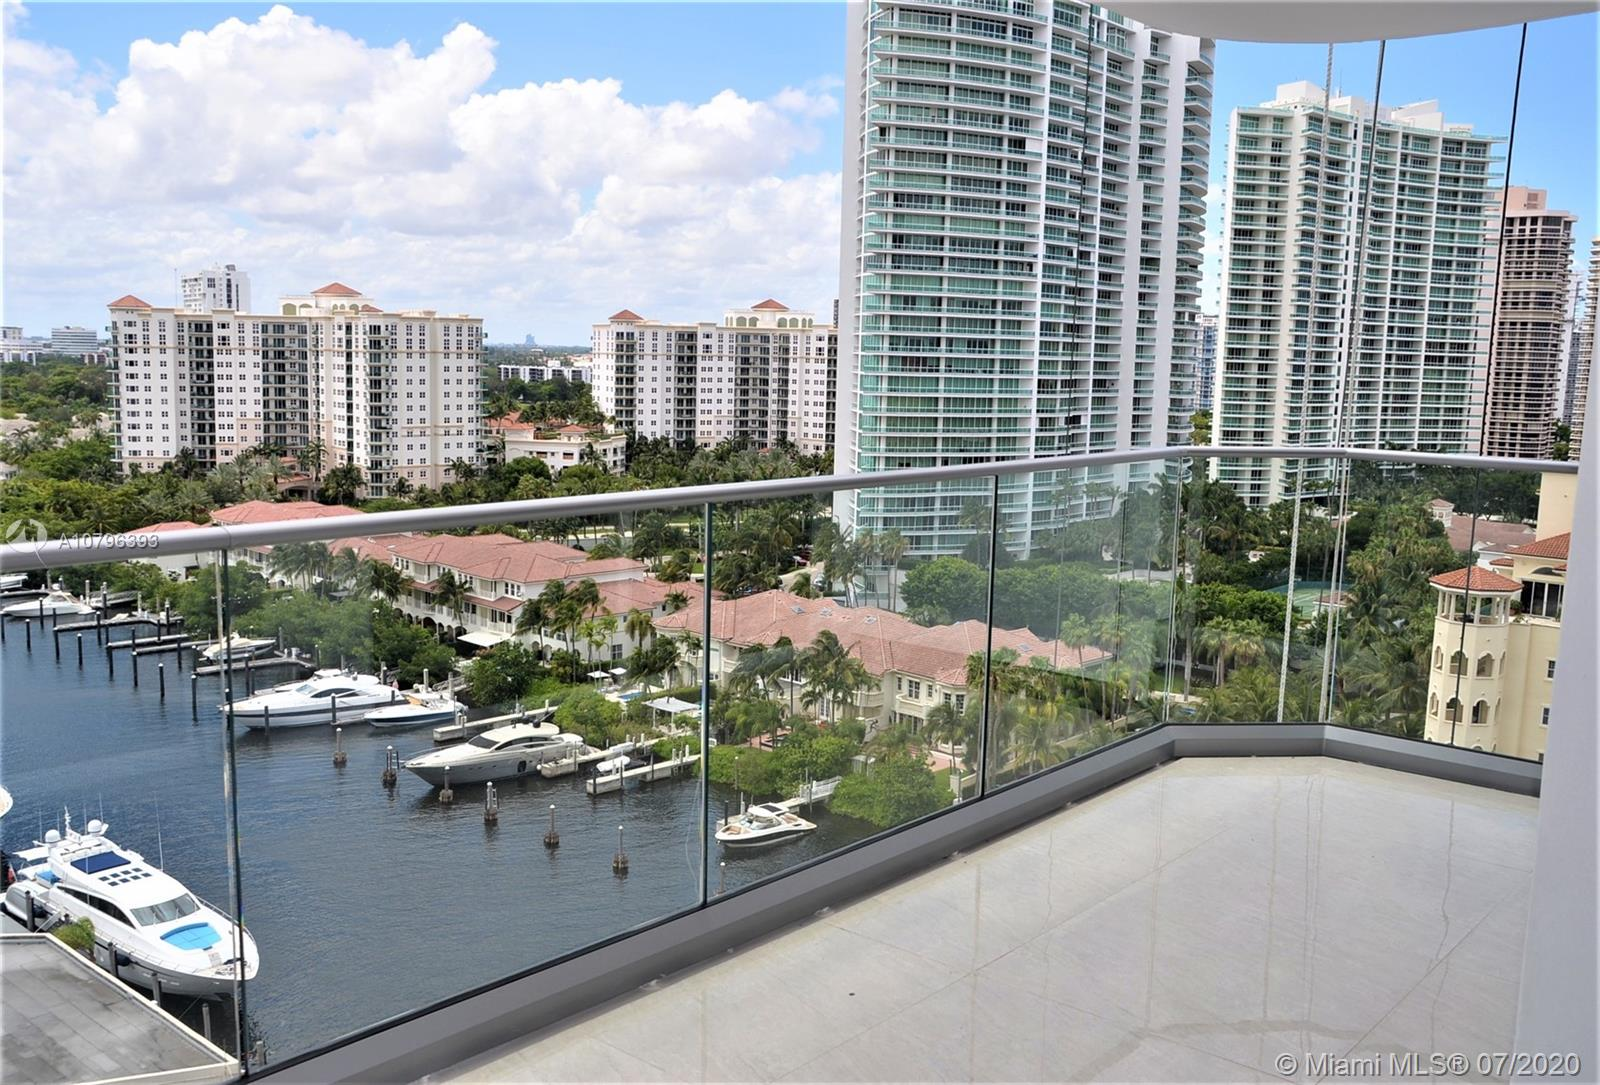 19707 NE Turnberry Way #16L, Aventura, FL 33180 - Aventura, FL real estate listing